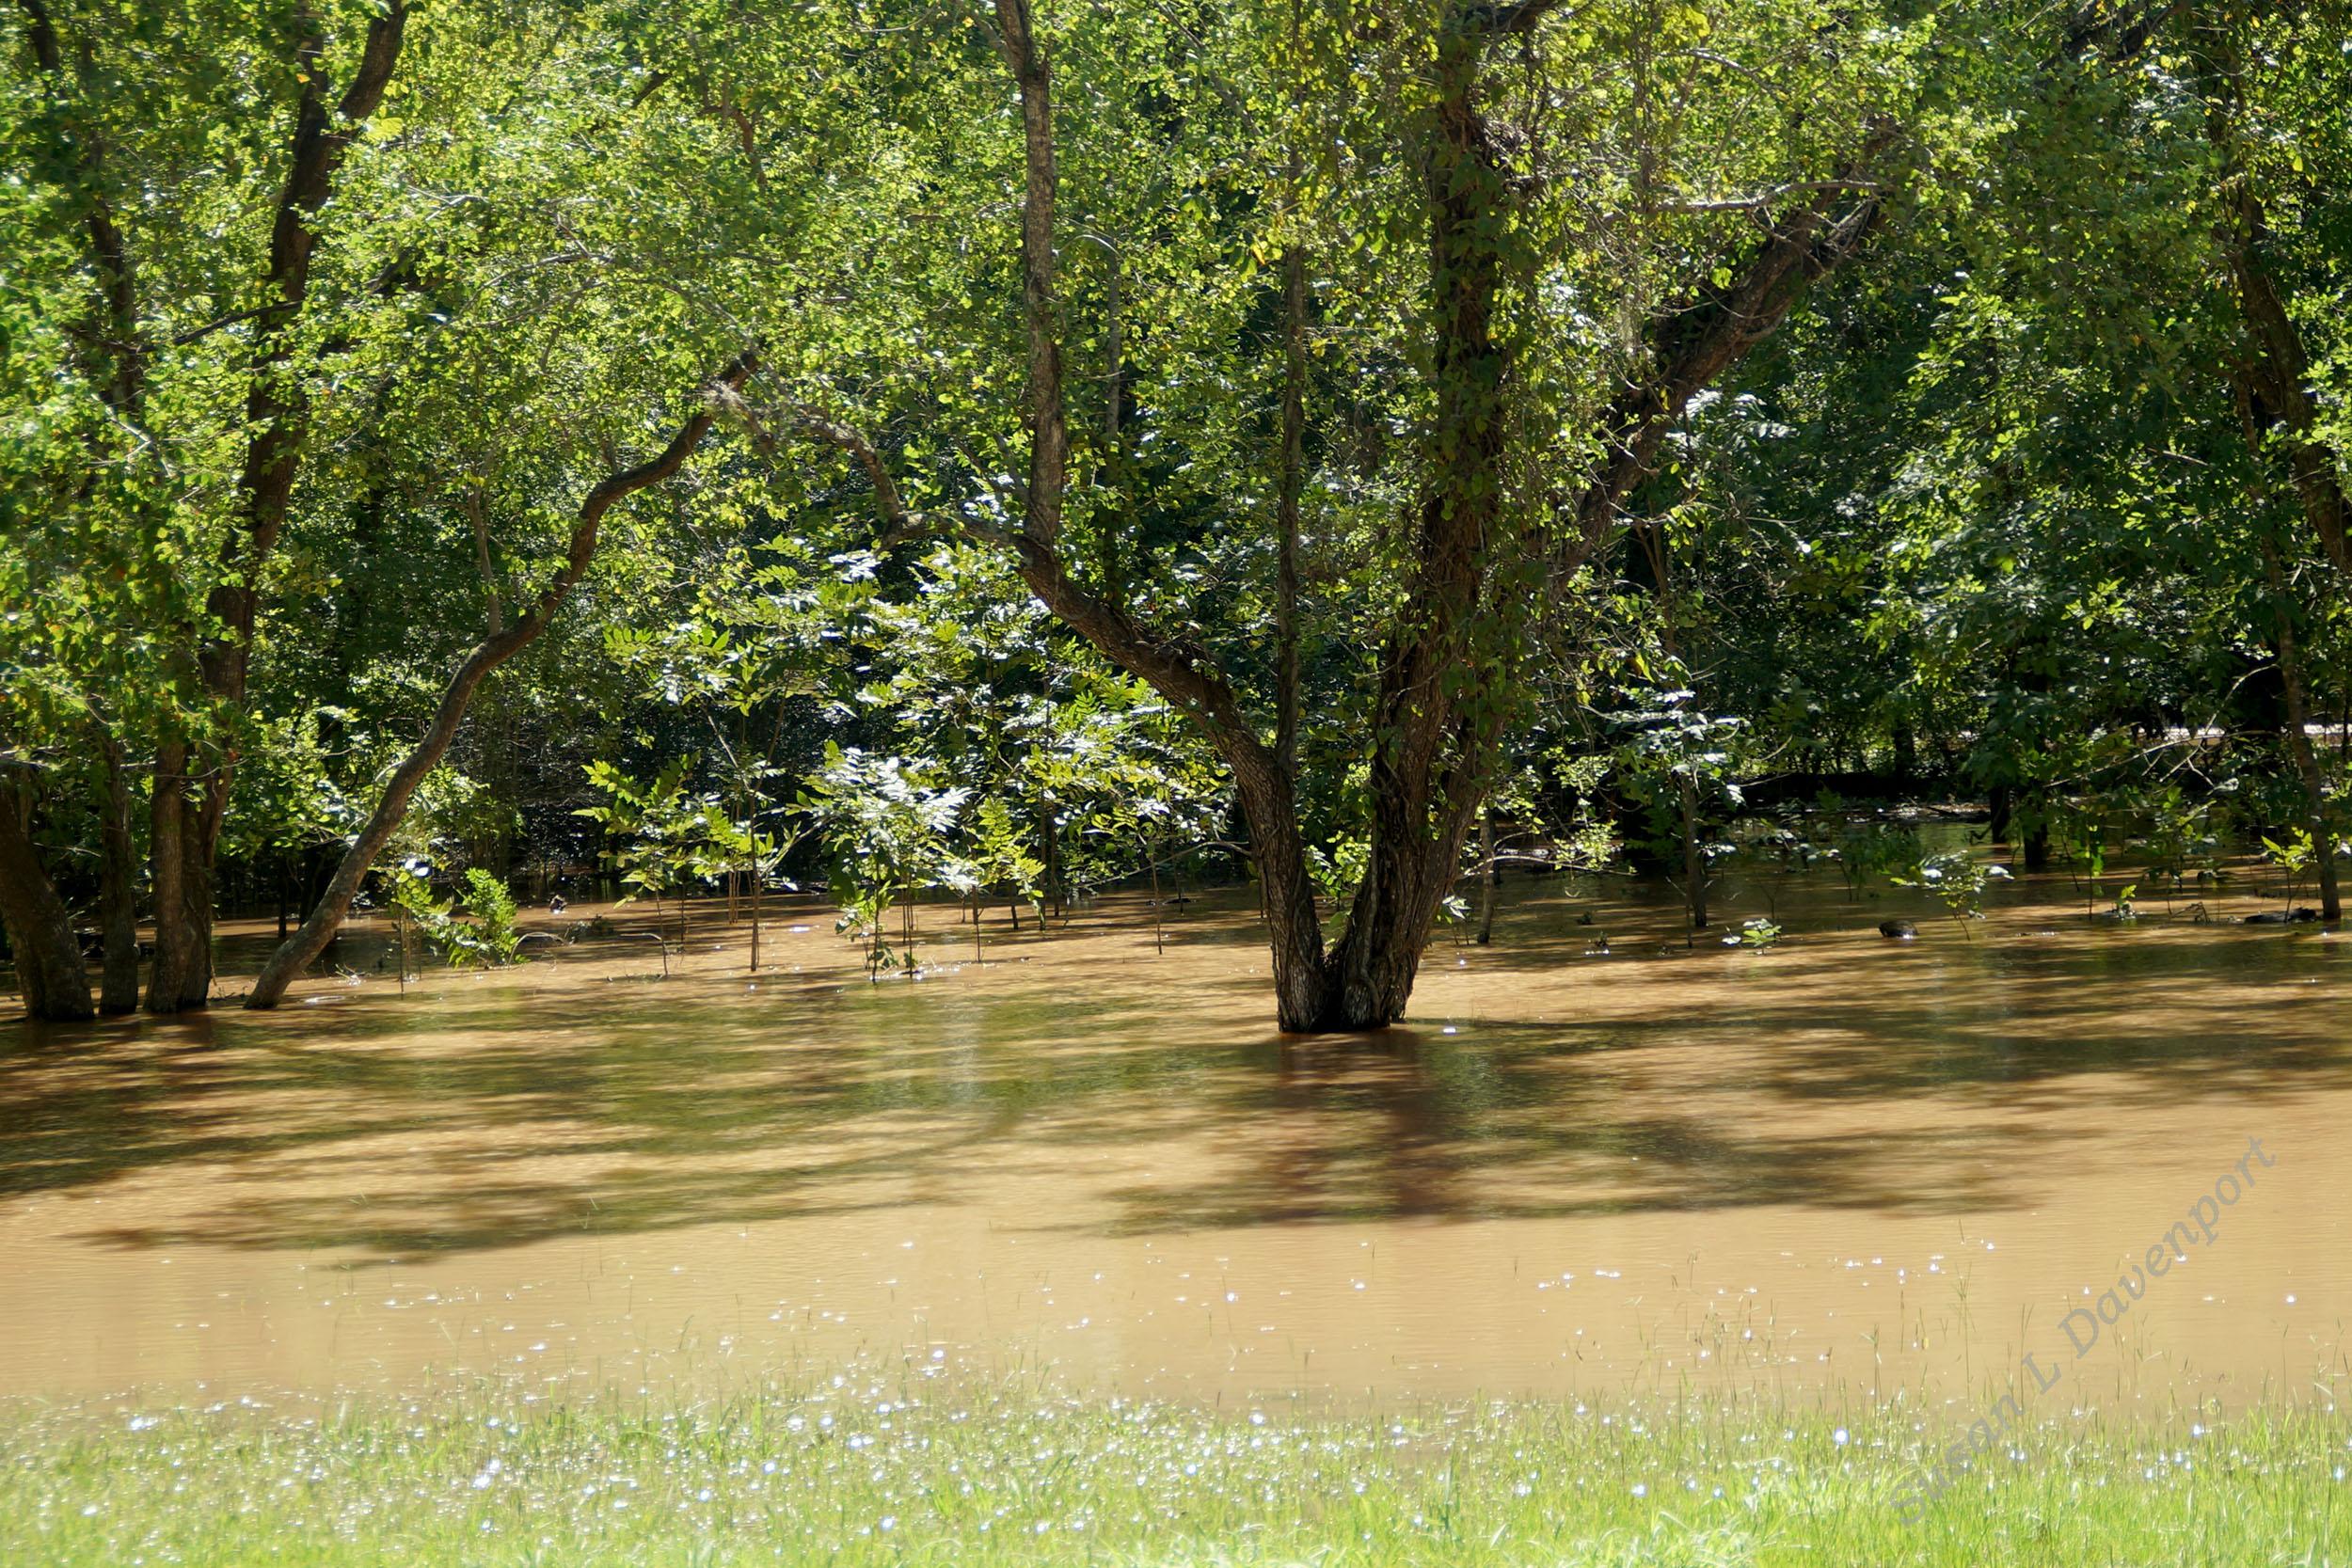 Hurricane Harvey: Flooded Neighbor's Yard